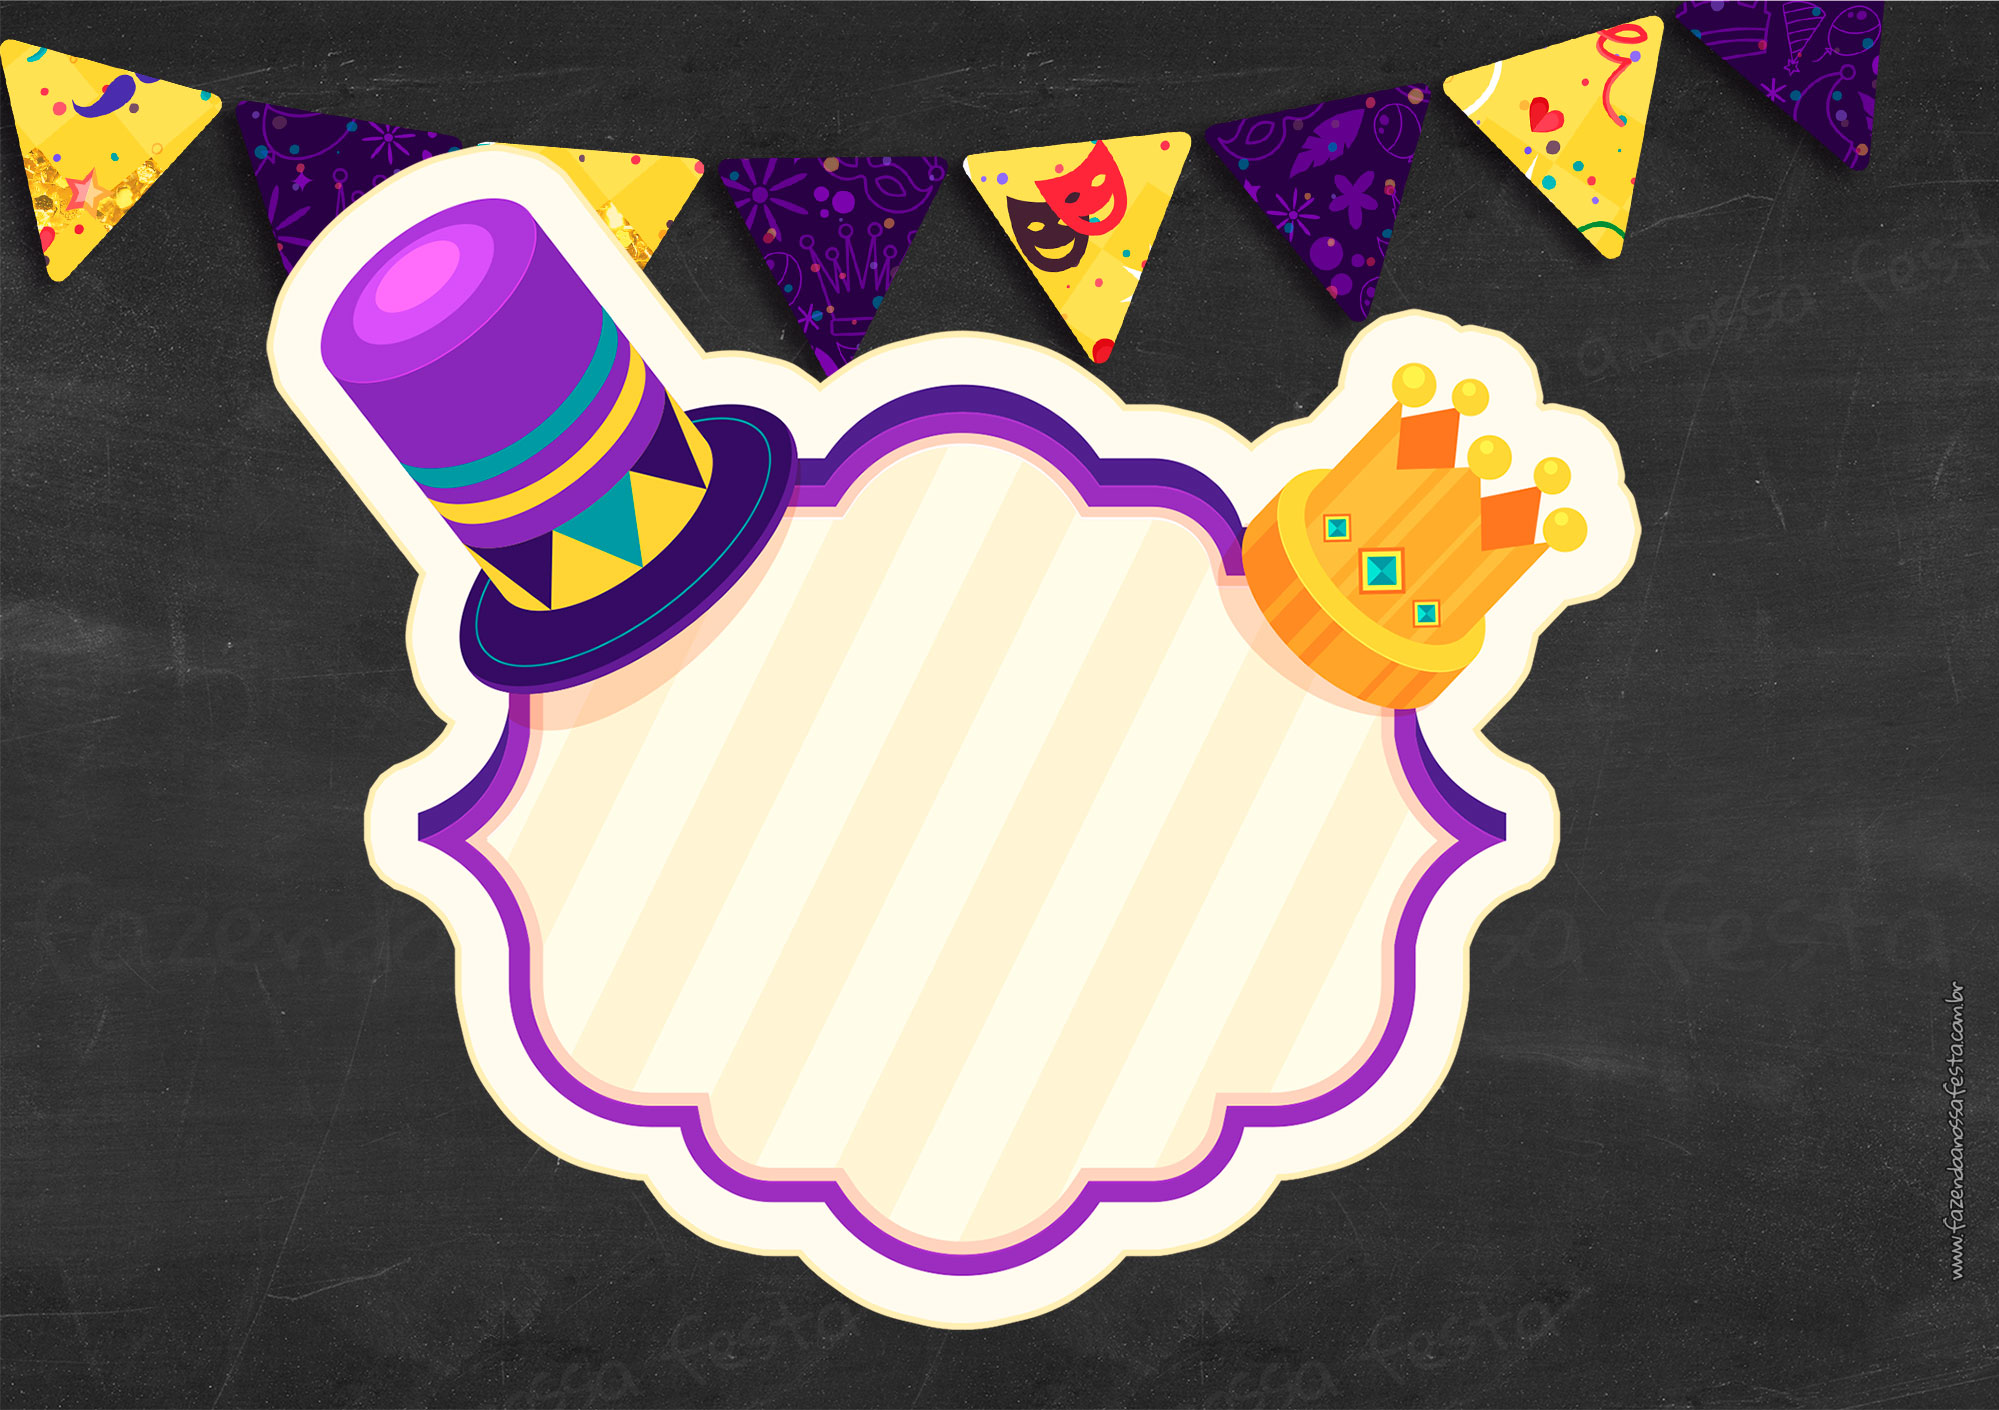 Convite Gratis para Festa de Carnaval